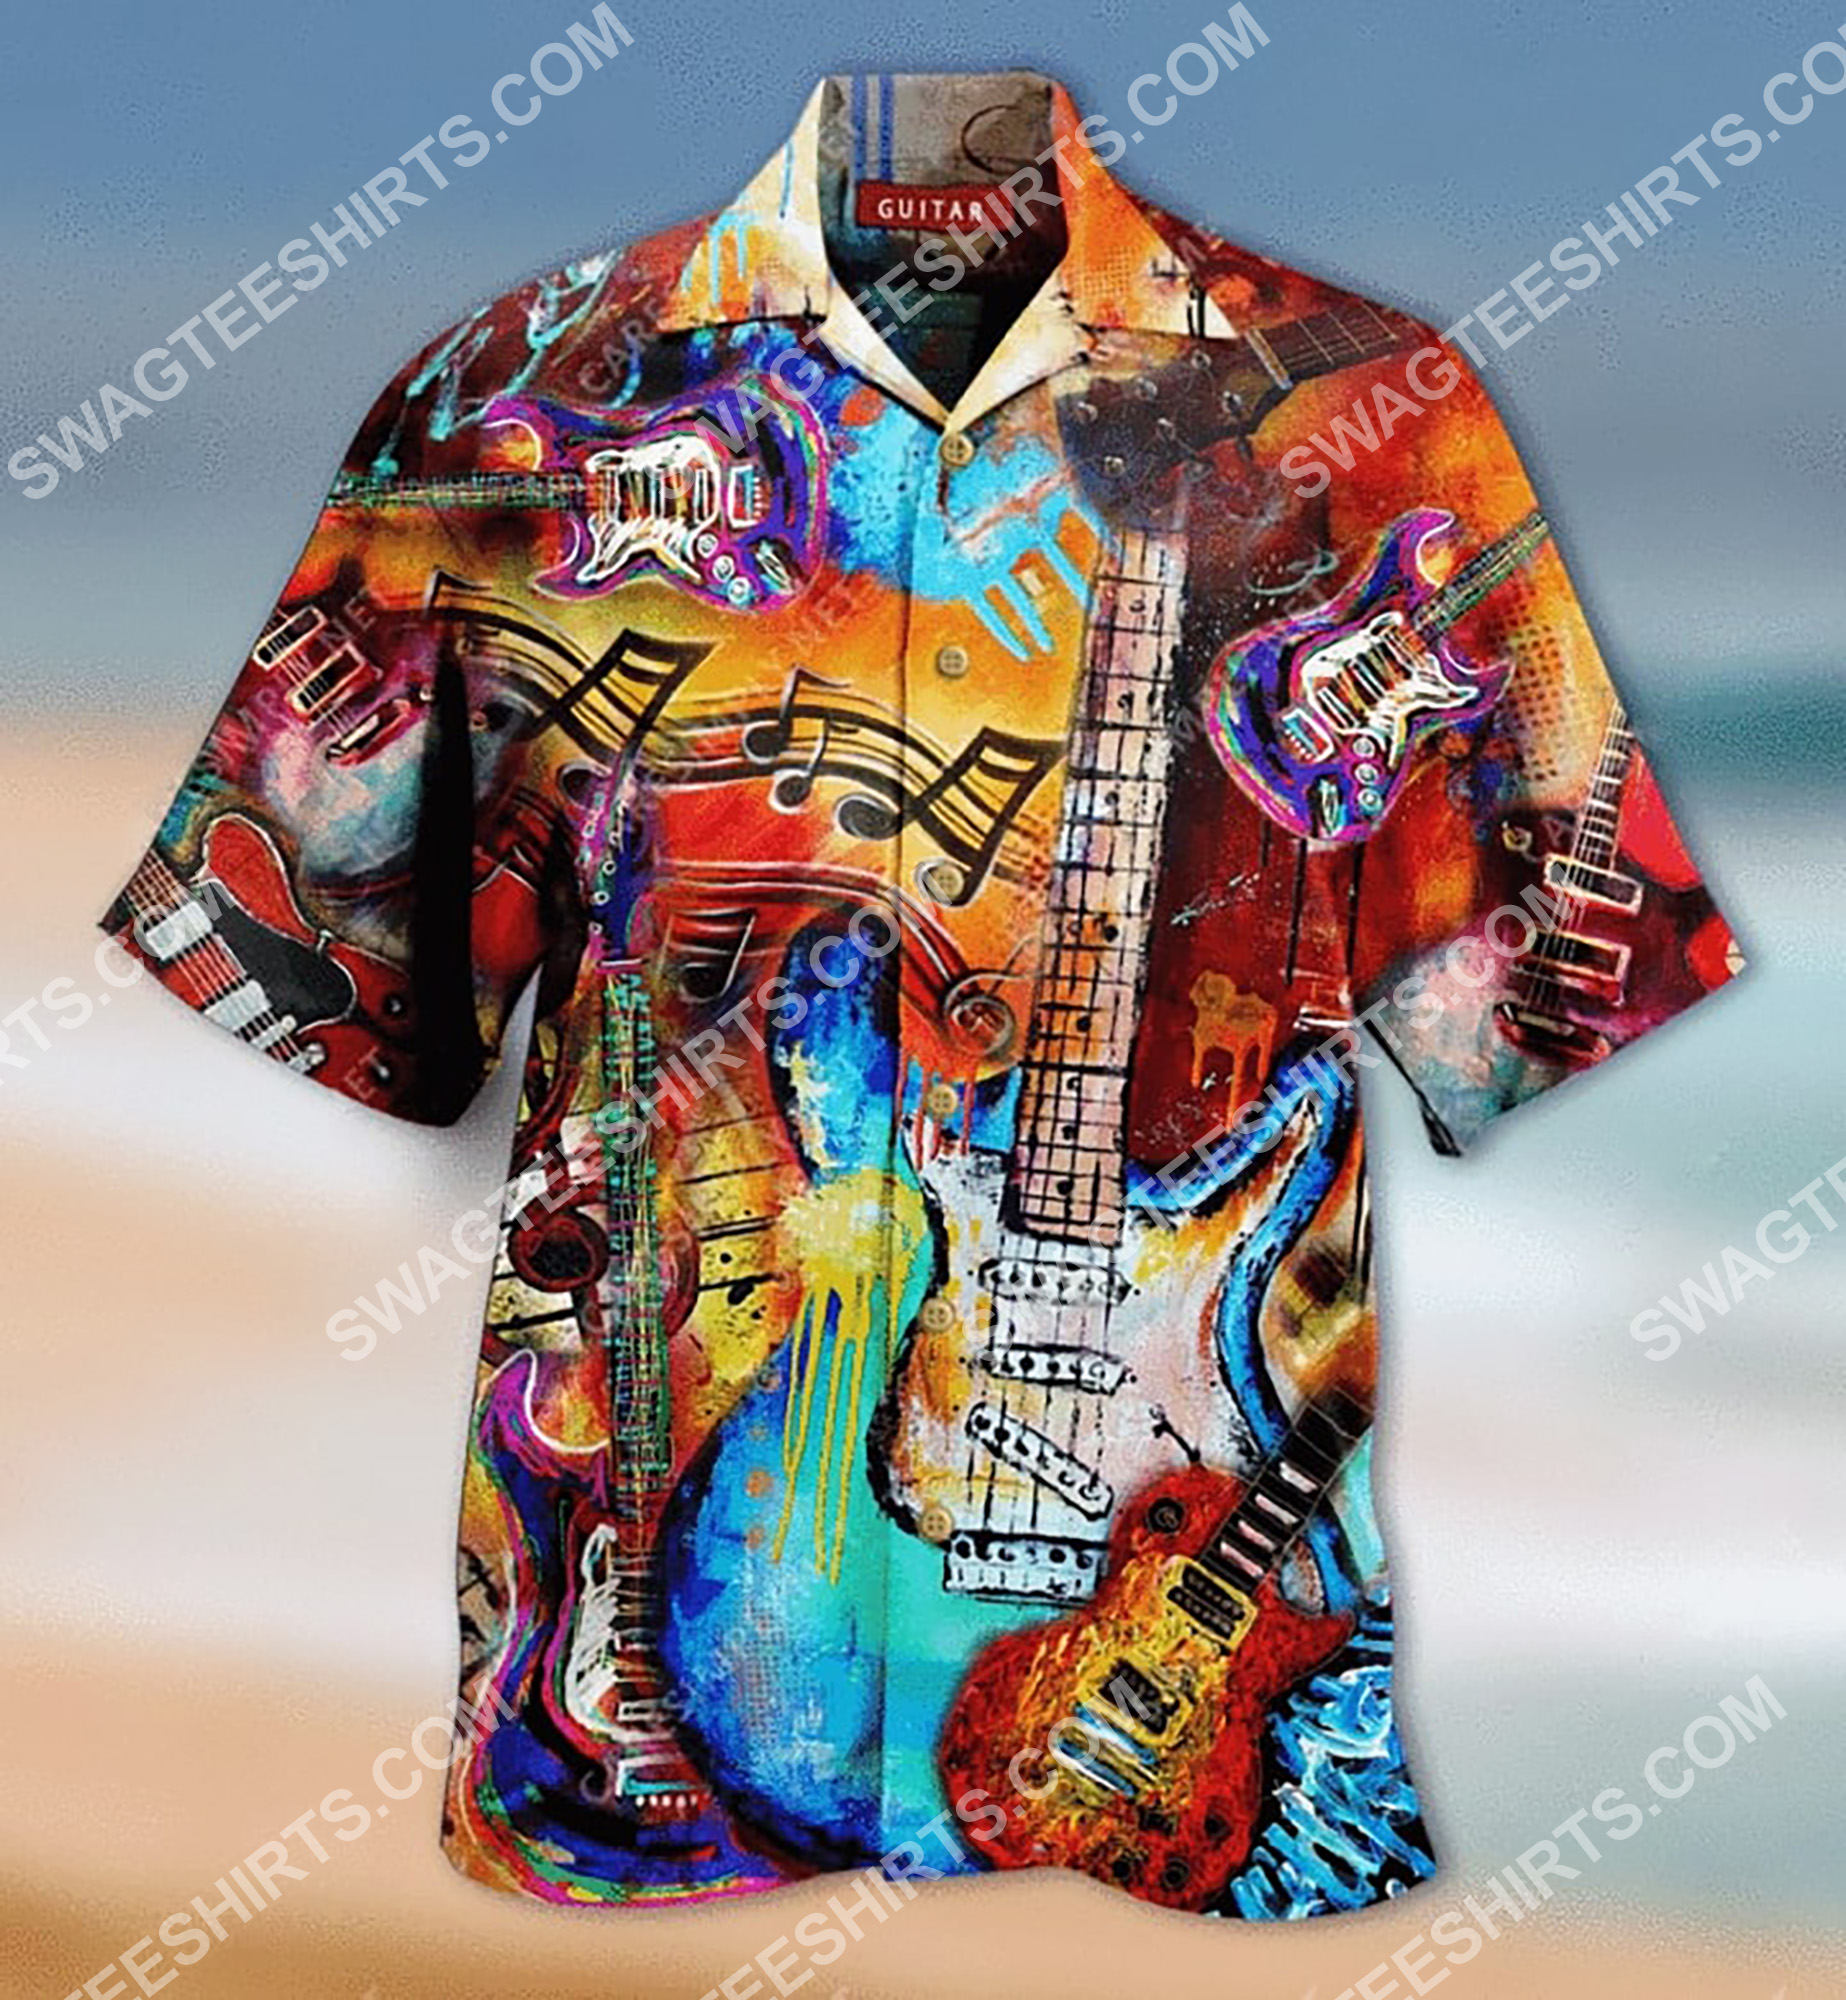 vintage guitar colorful all over printing hawaiian shirt 2(1) - Copy